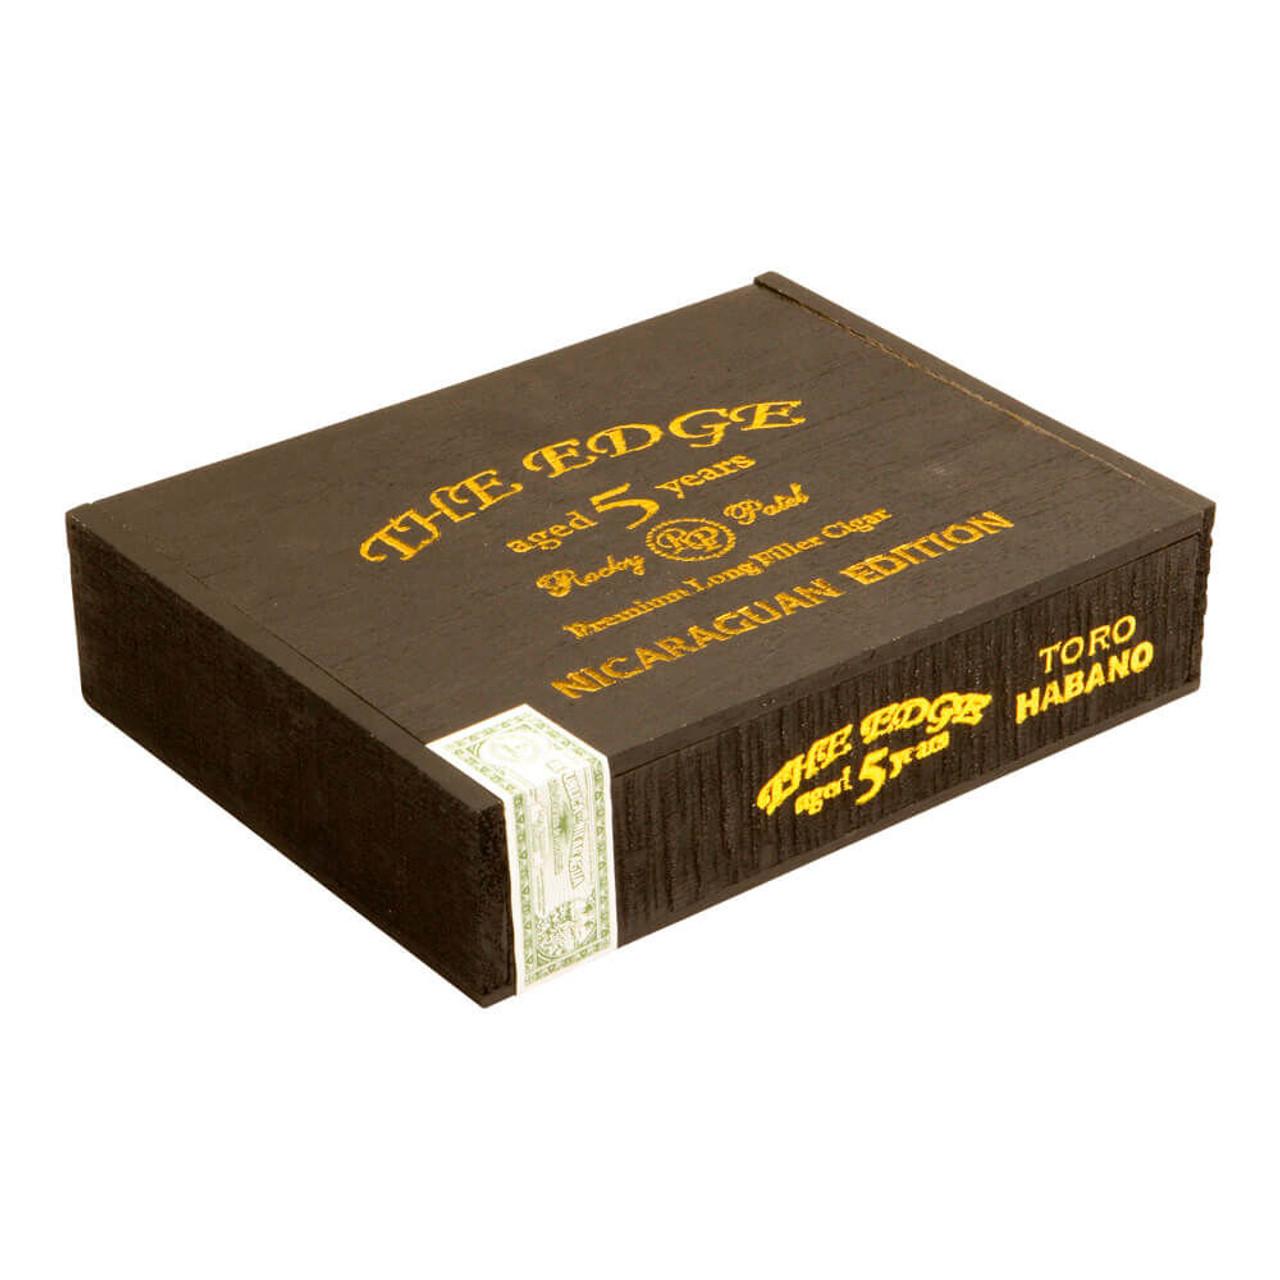 Rocky Patel The Edge Habano Toro Cigars - 6 x 52 (Box of 20)